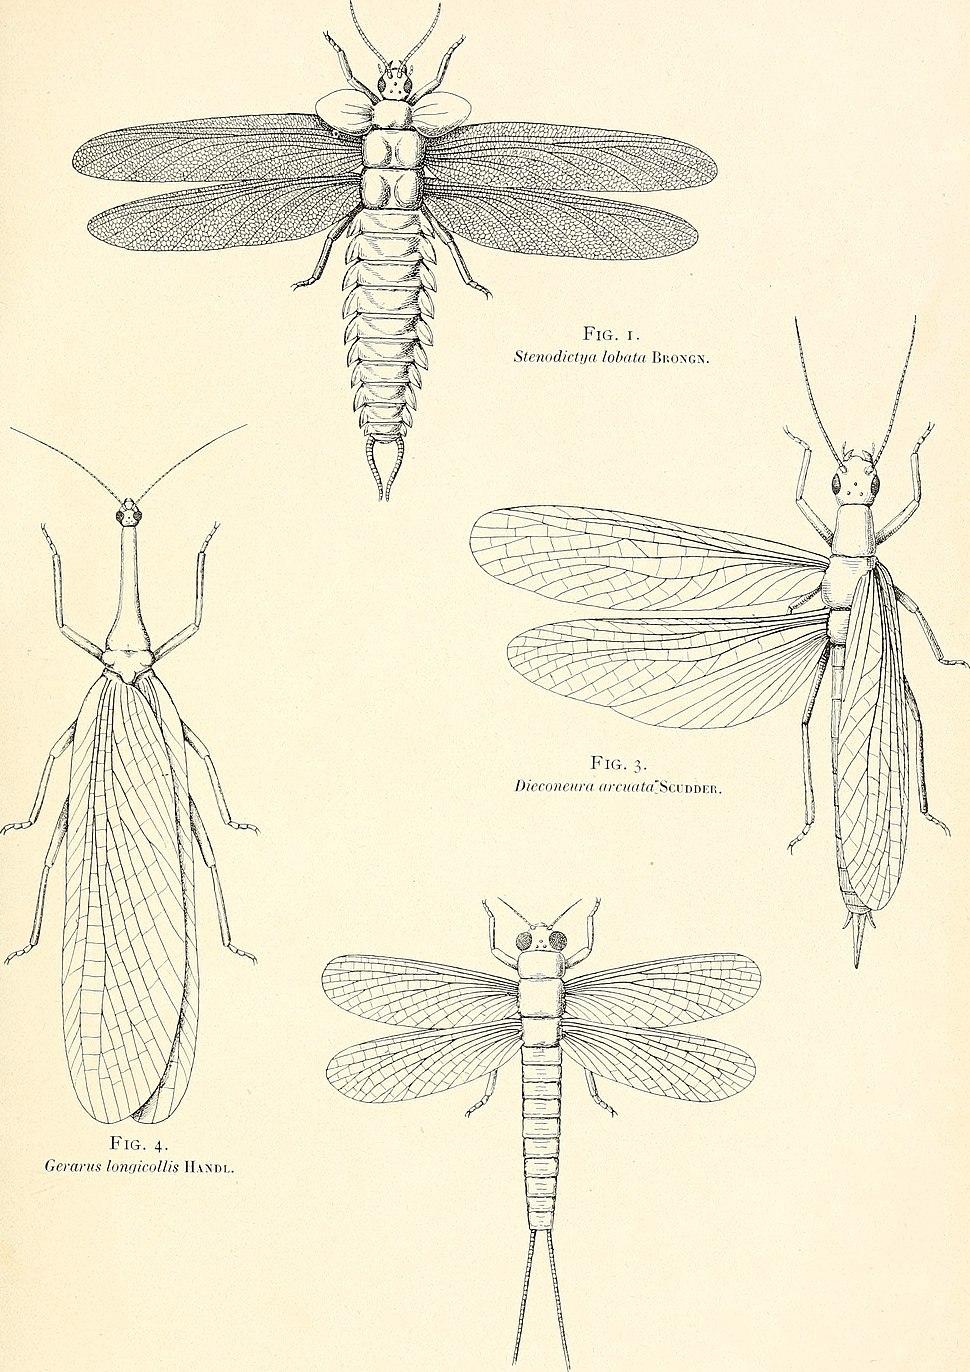 1er Congrès international d'entomologie, Bruxelles, 1-6 août, 1910 (1911-12) (16477916279)